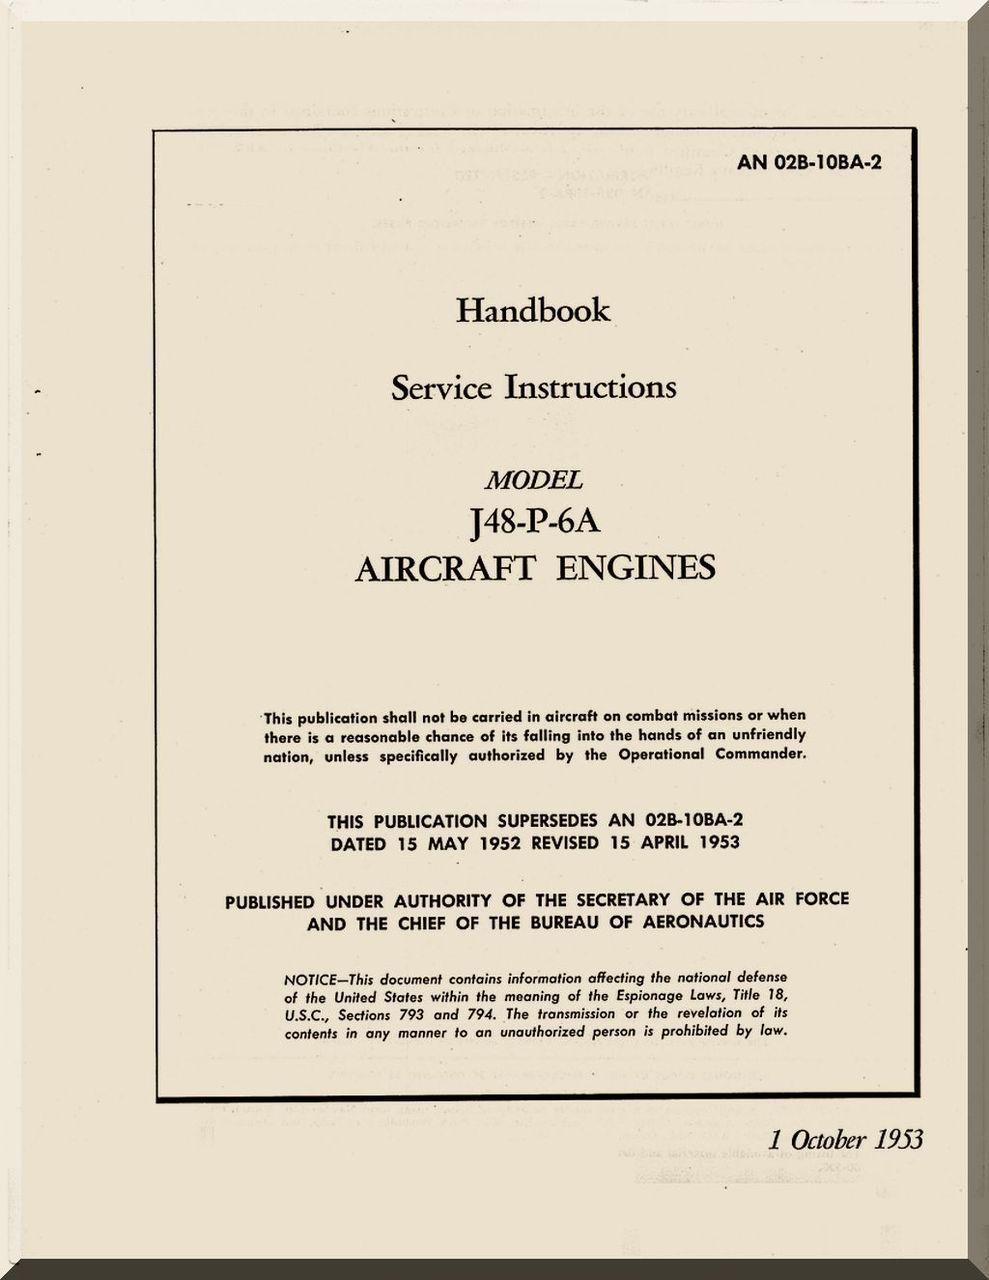 Pratt whitney j48 p 6 aircraft engine service instruction pratt whitney j48 p 6 aircraft engine service instruction handnook manual 1953 sciox Images